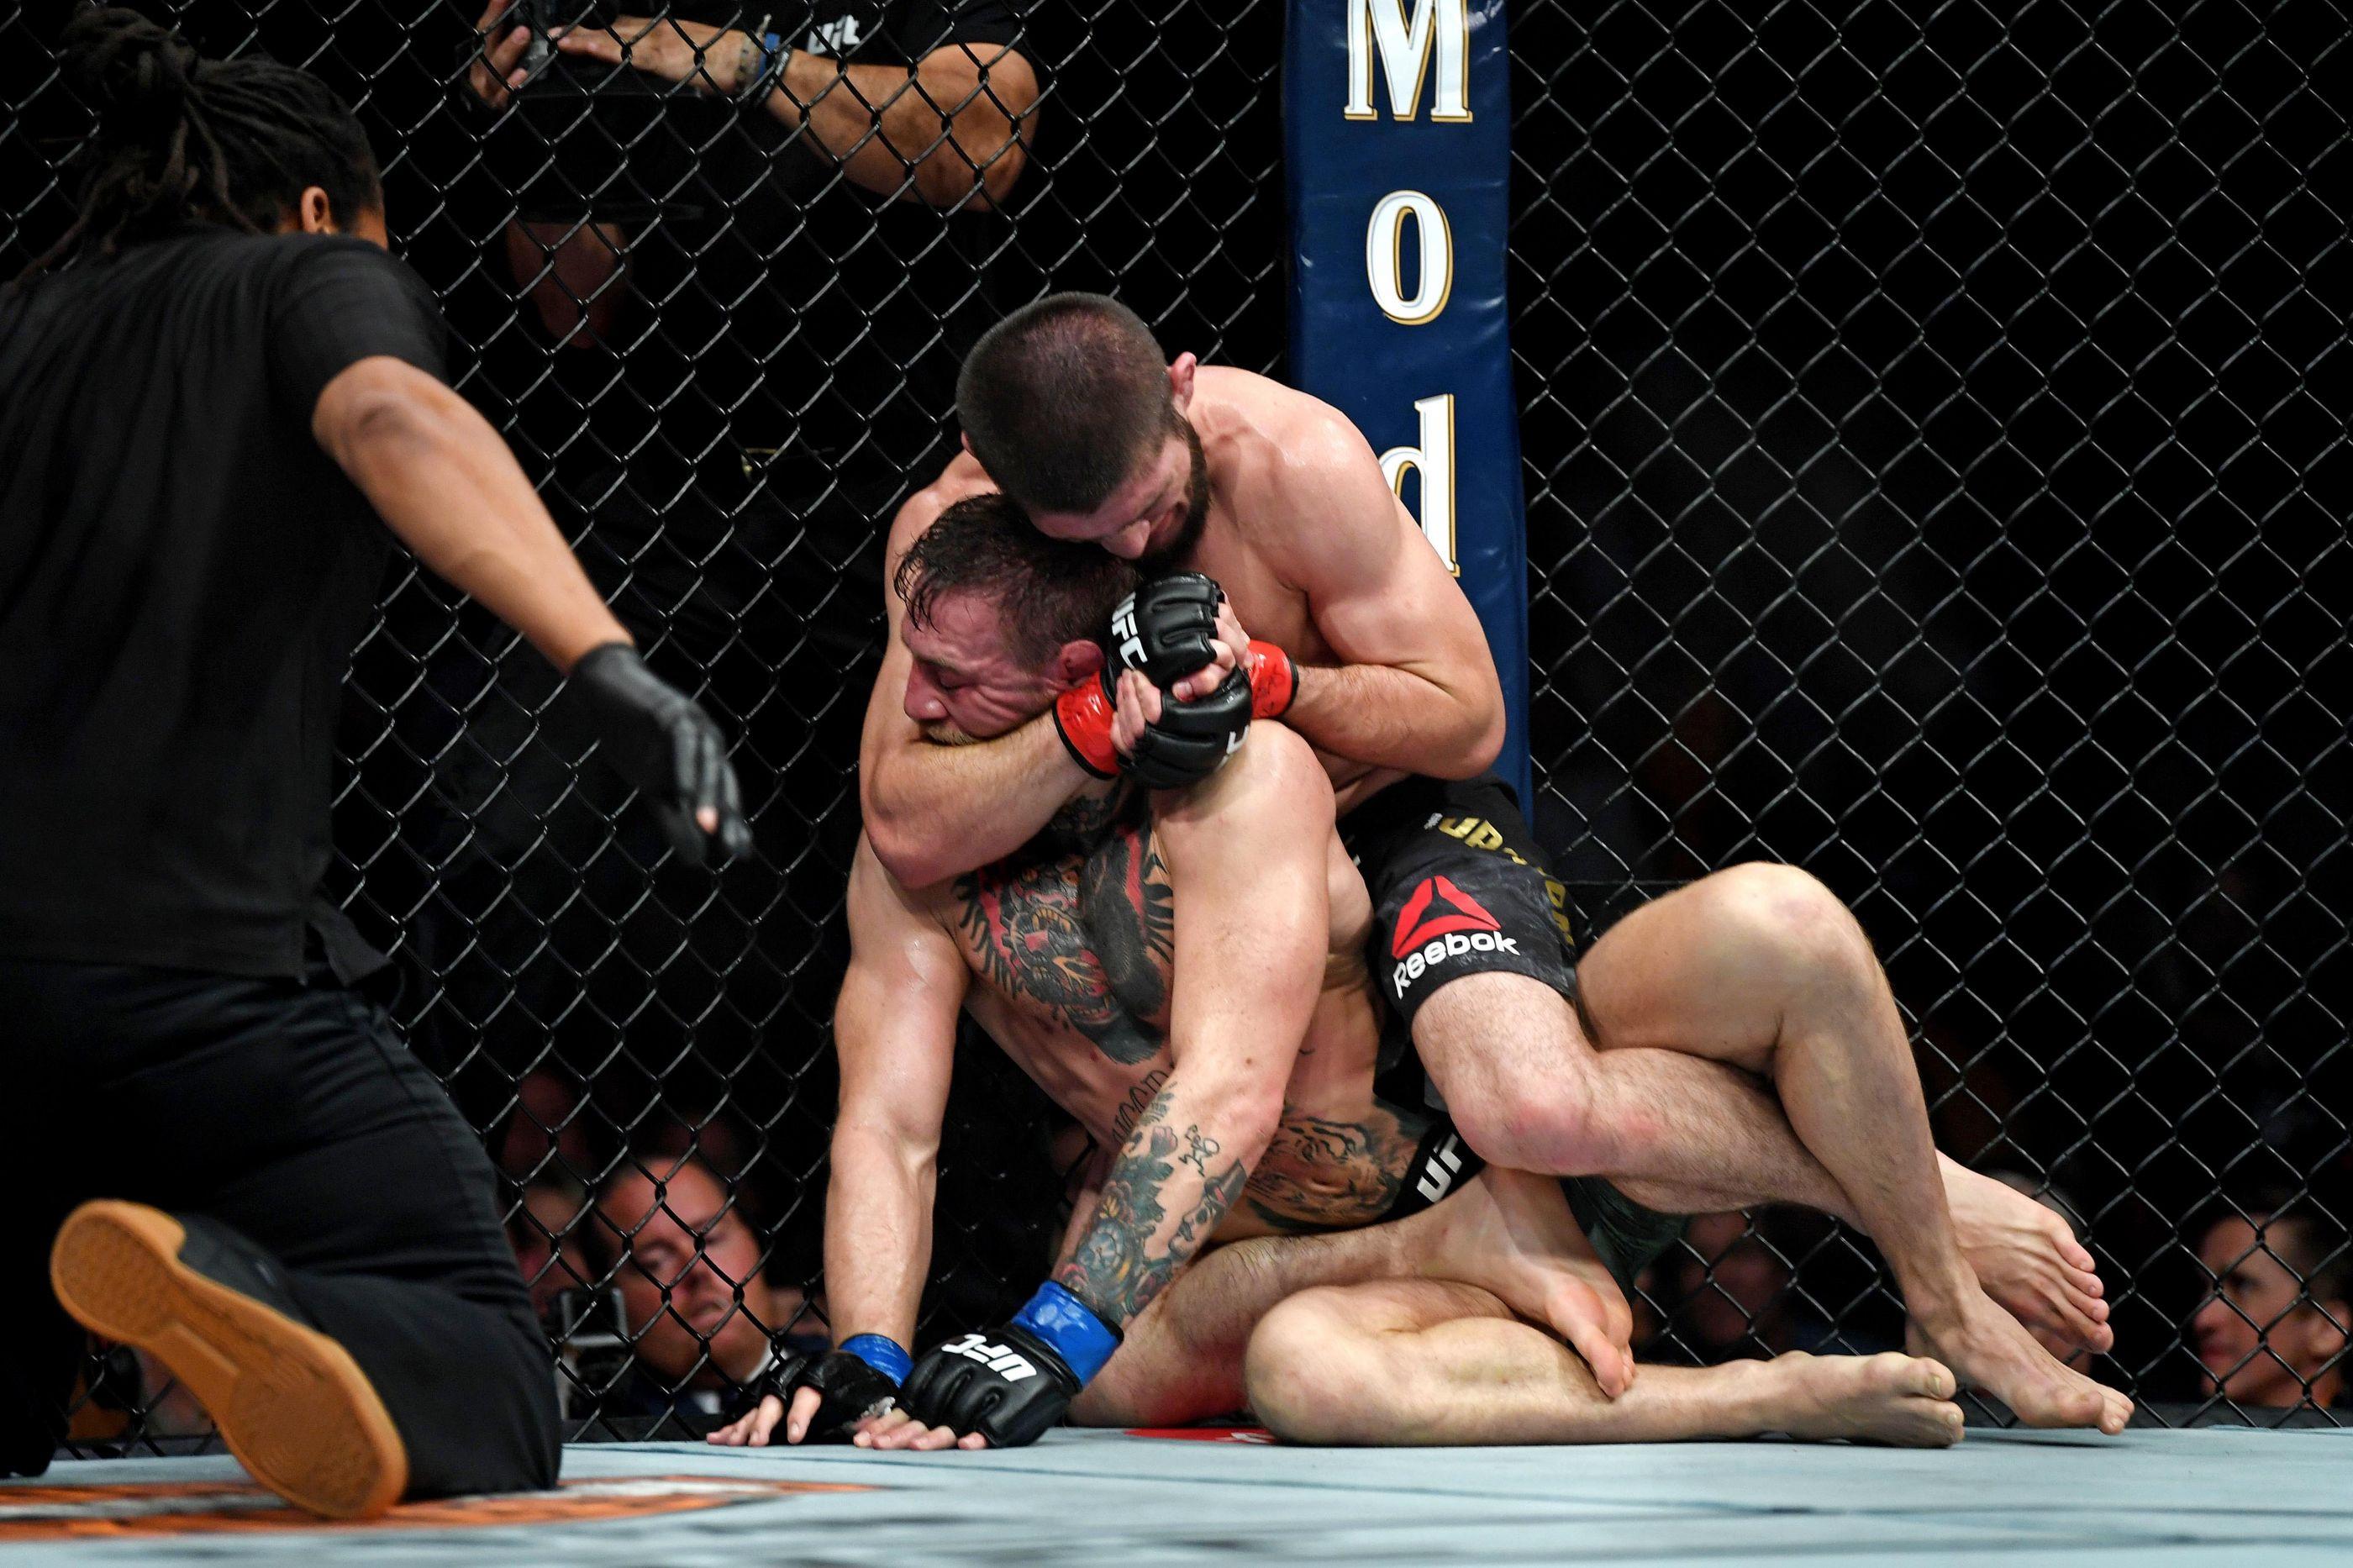 Khabib bate McGregor e provoca 'batalha campal' no octógono